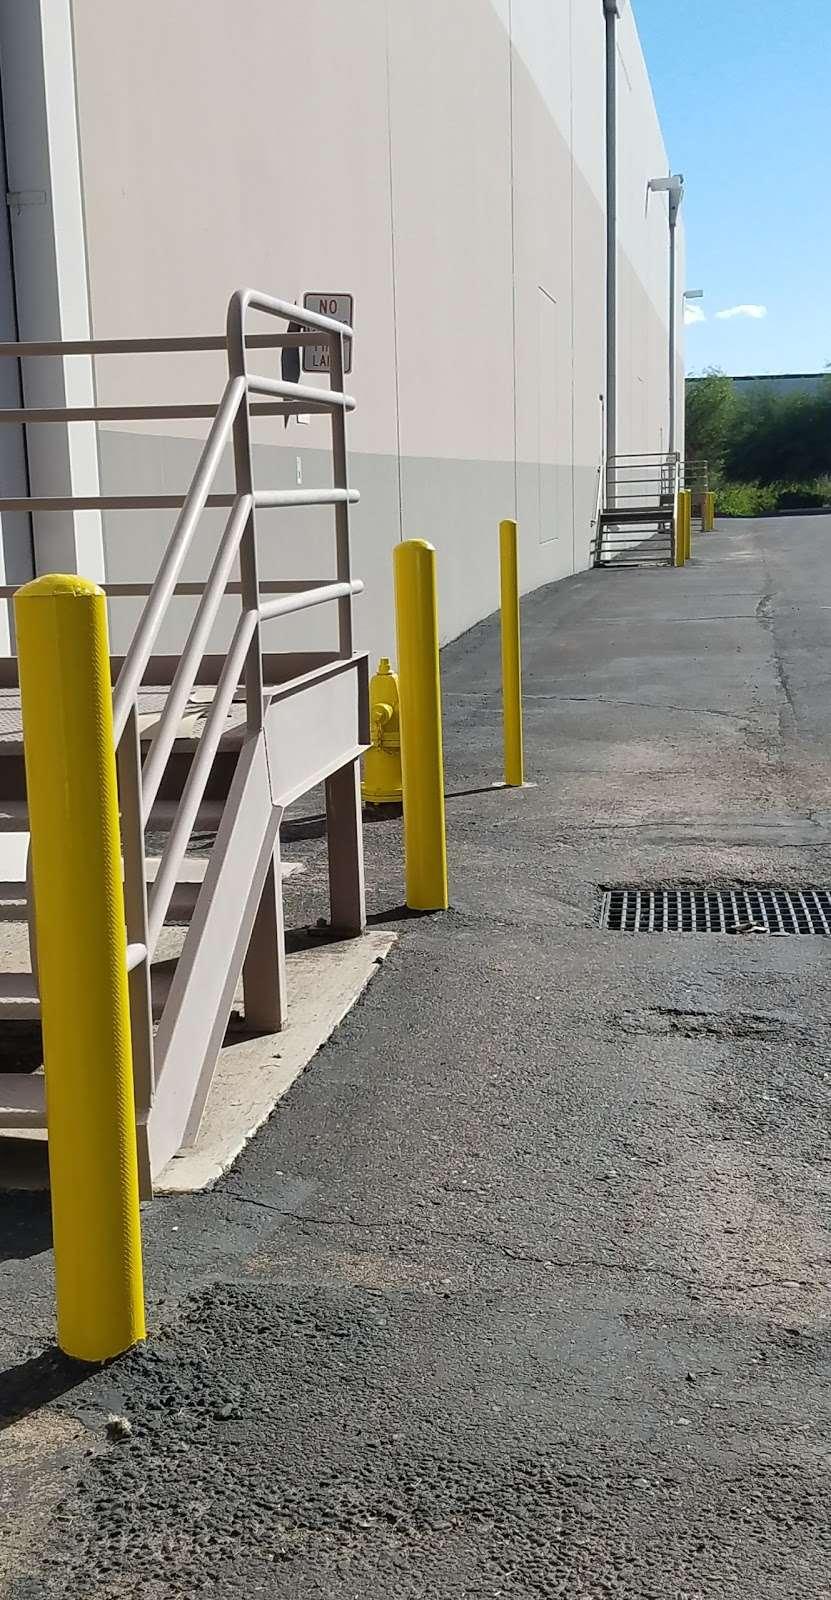 Bose Corporation - storage  | Photo 1 of 10 | Address: 130 S 83rd Ave, Tolleson, AZ 85353, USA | Phone: (623) 936-8333